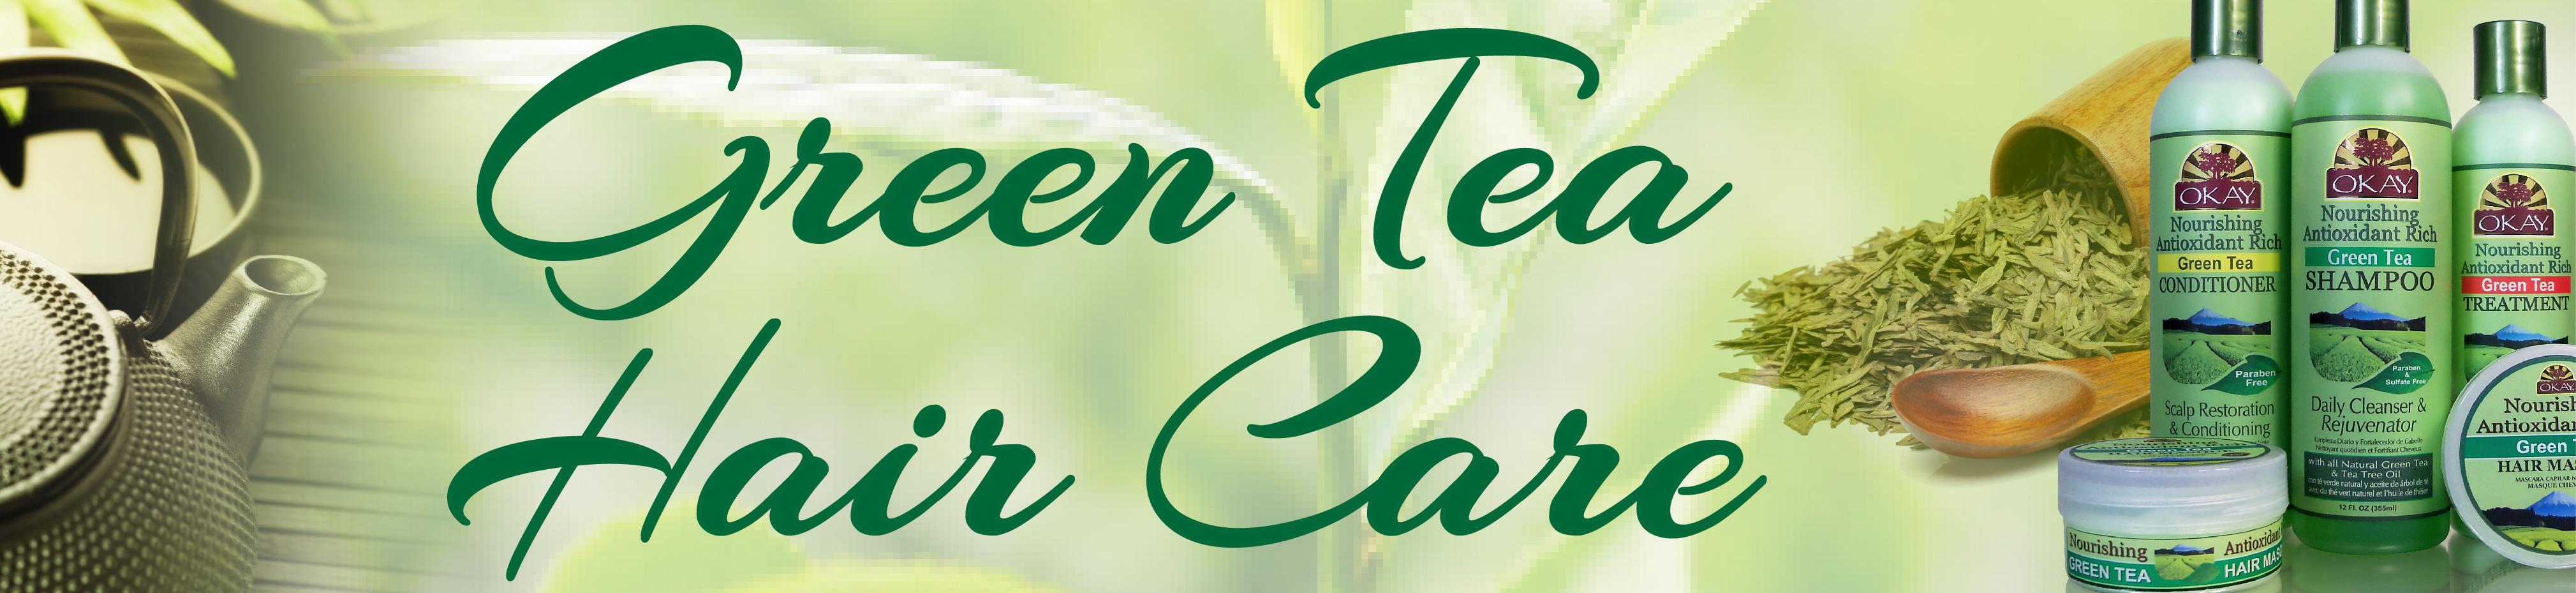 green-tea-11-11.jpg